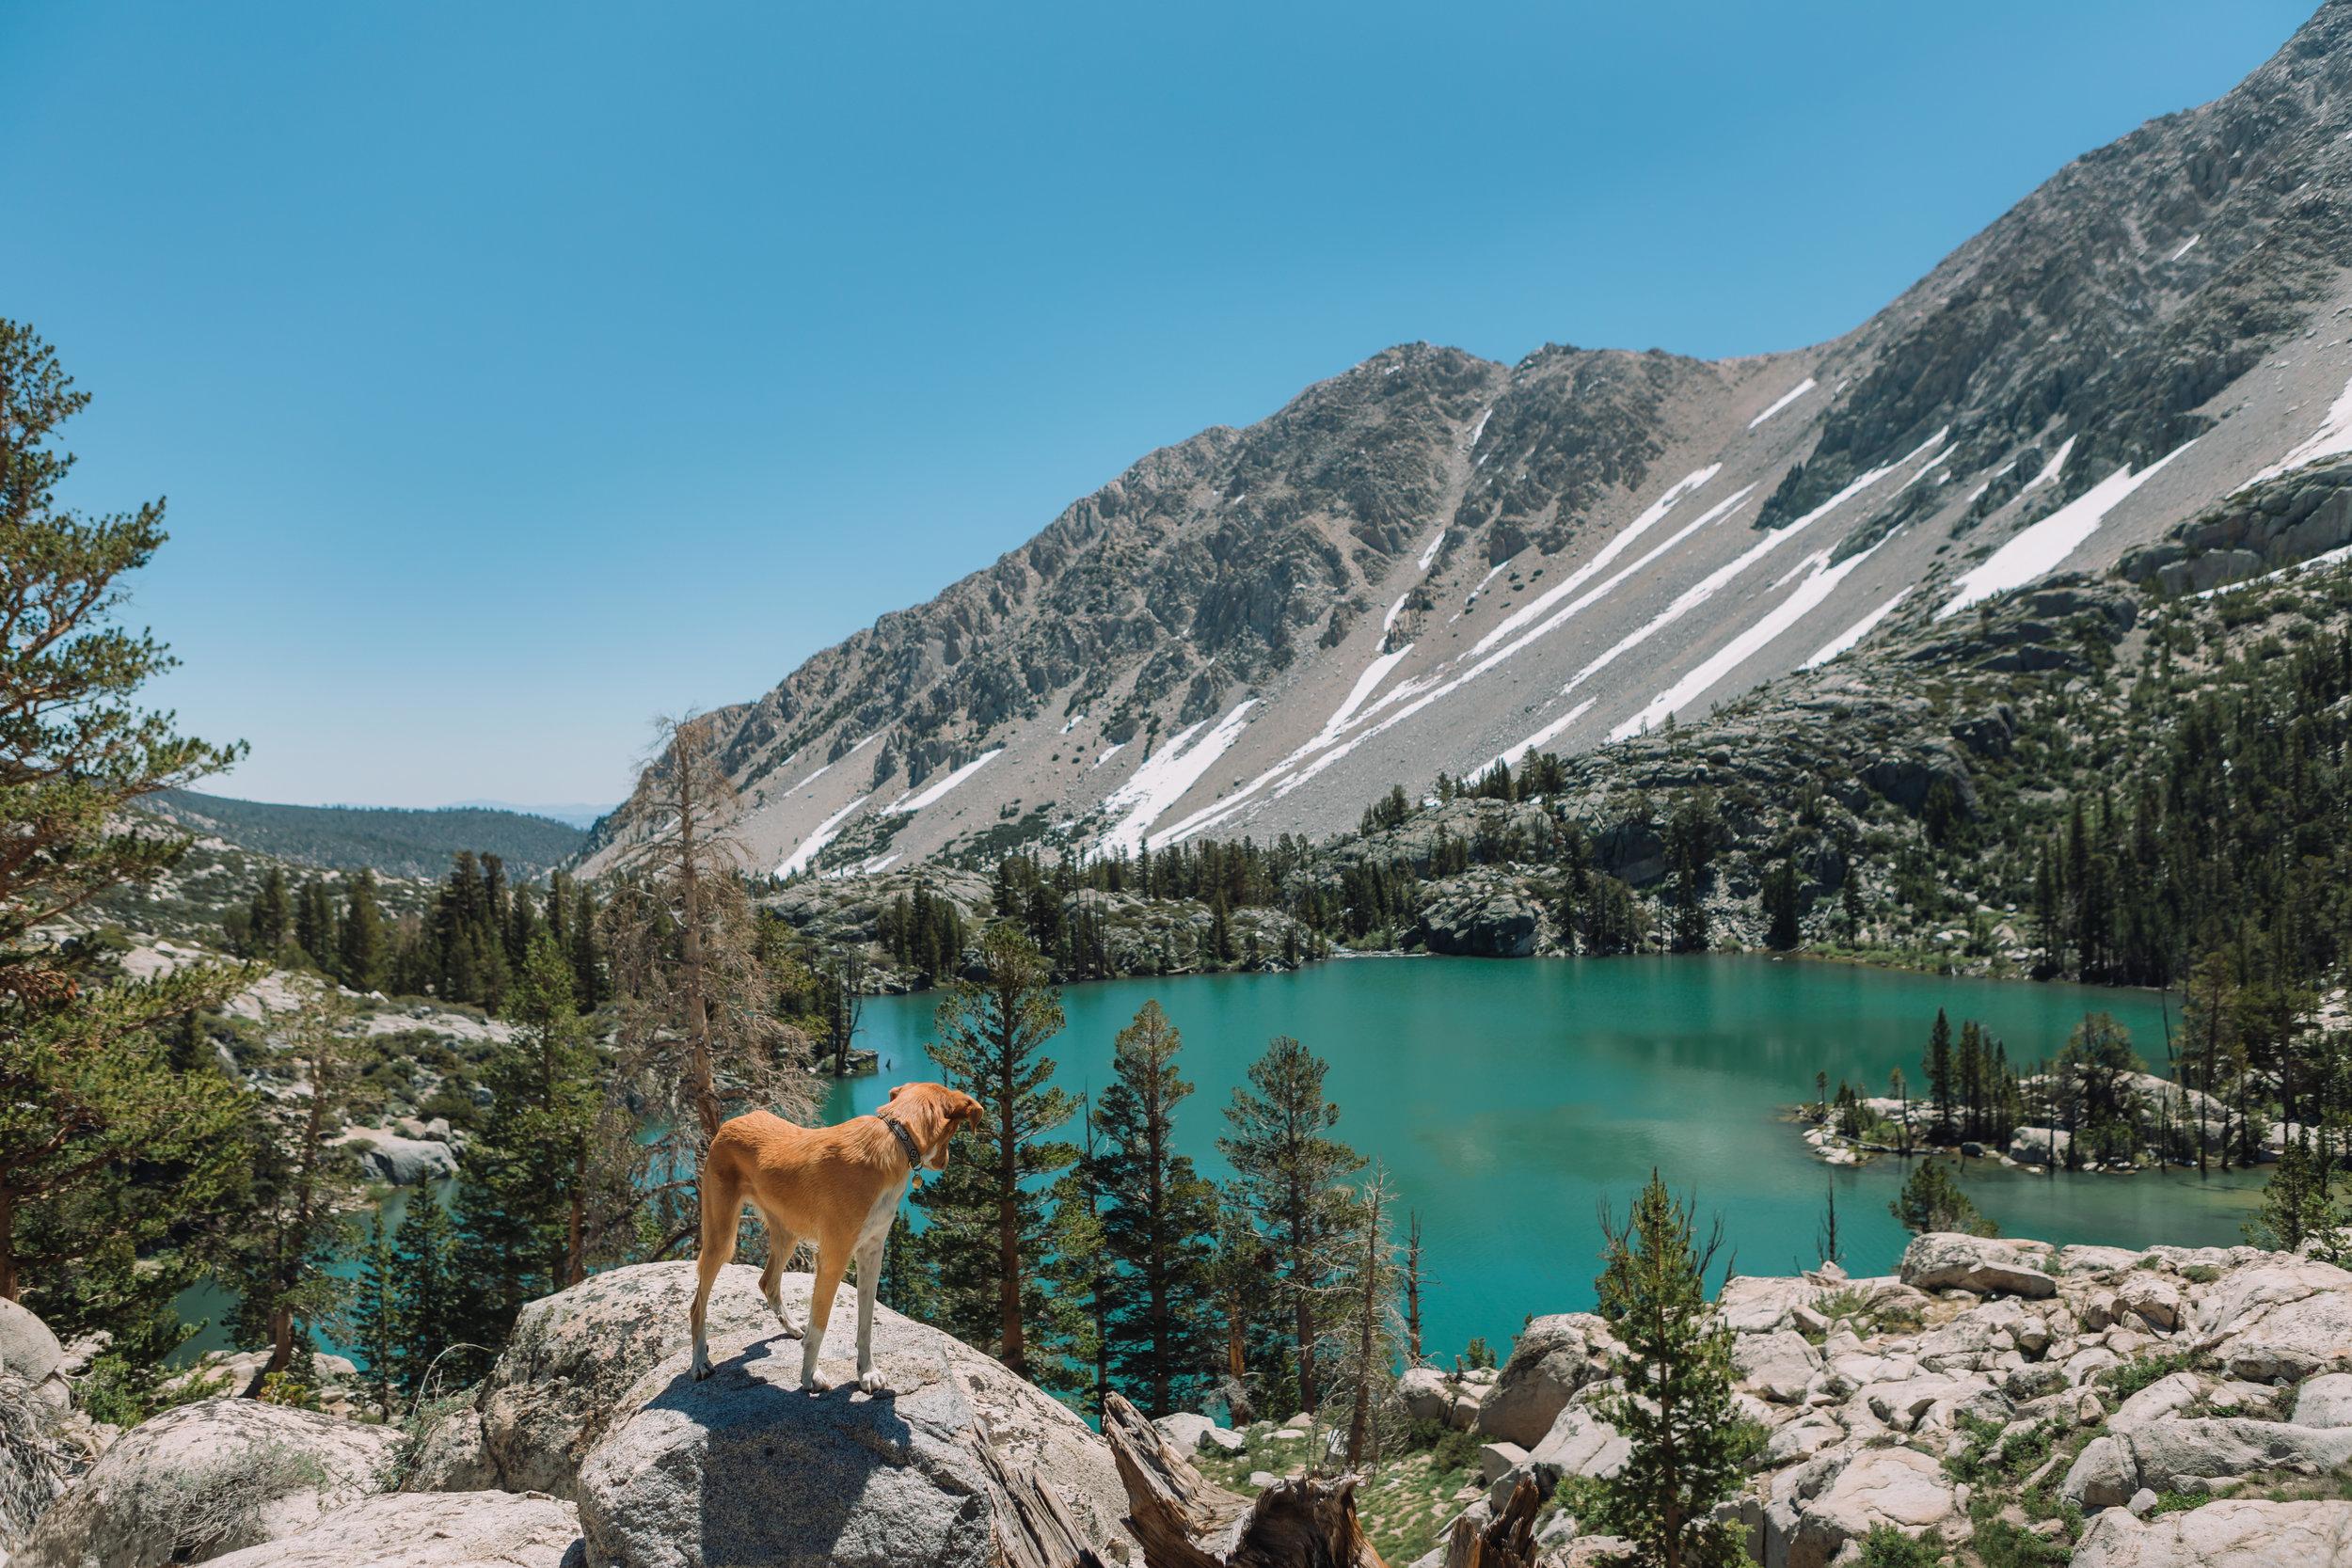 First Lake, John Muir Wilderness, CA | July 2016